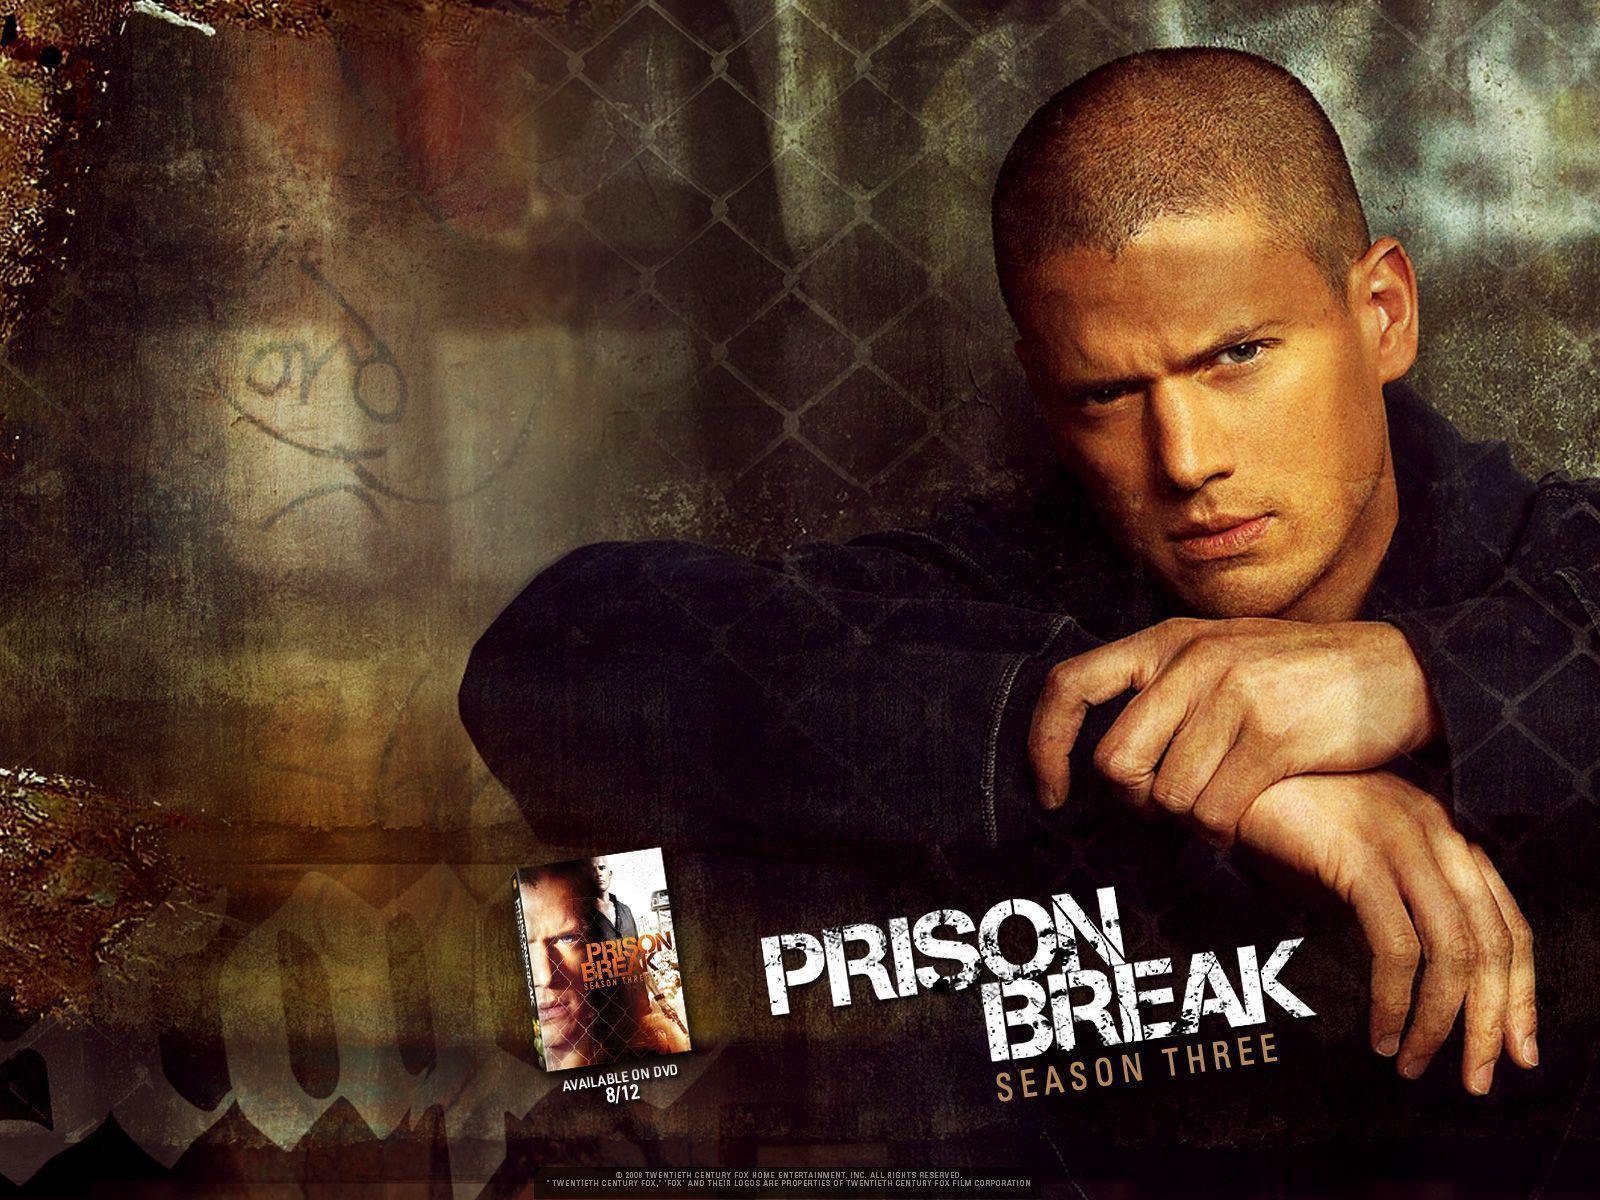 Torrent Download Prison Break Season 3 Episode 14